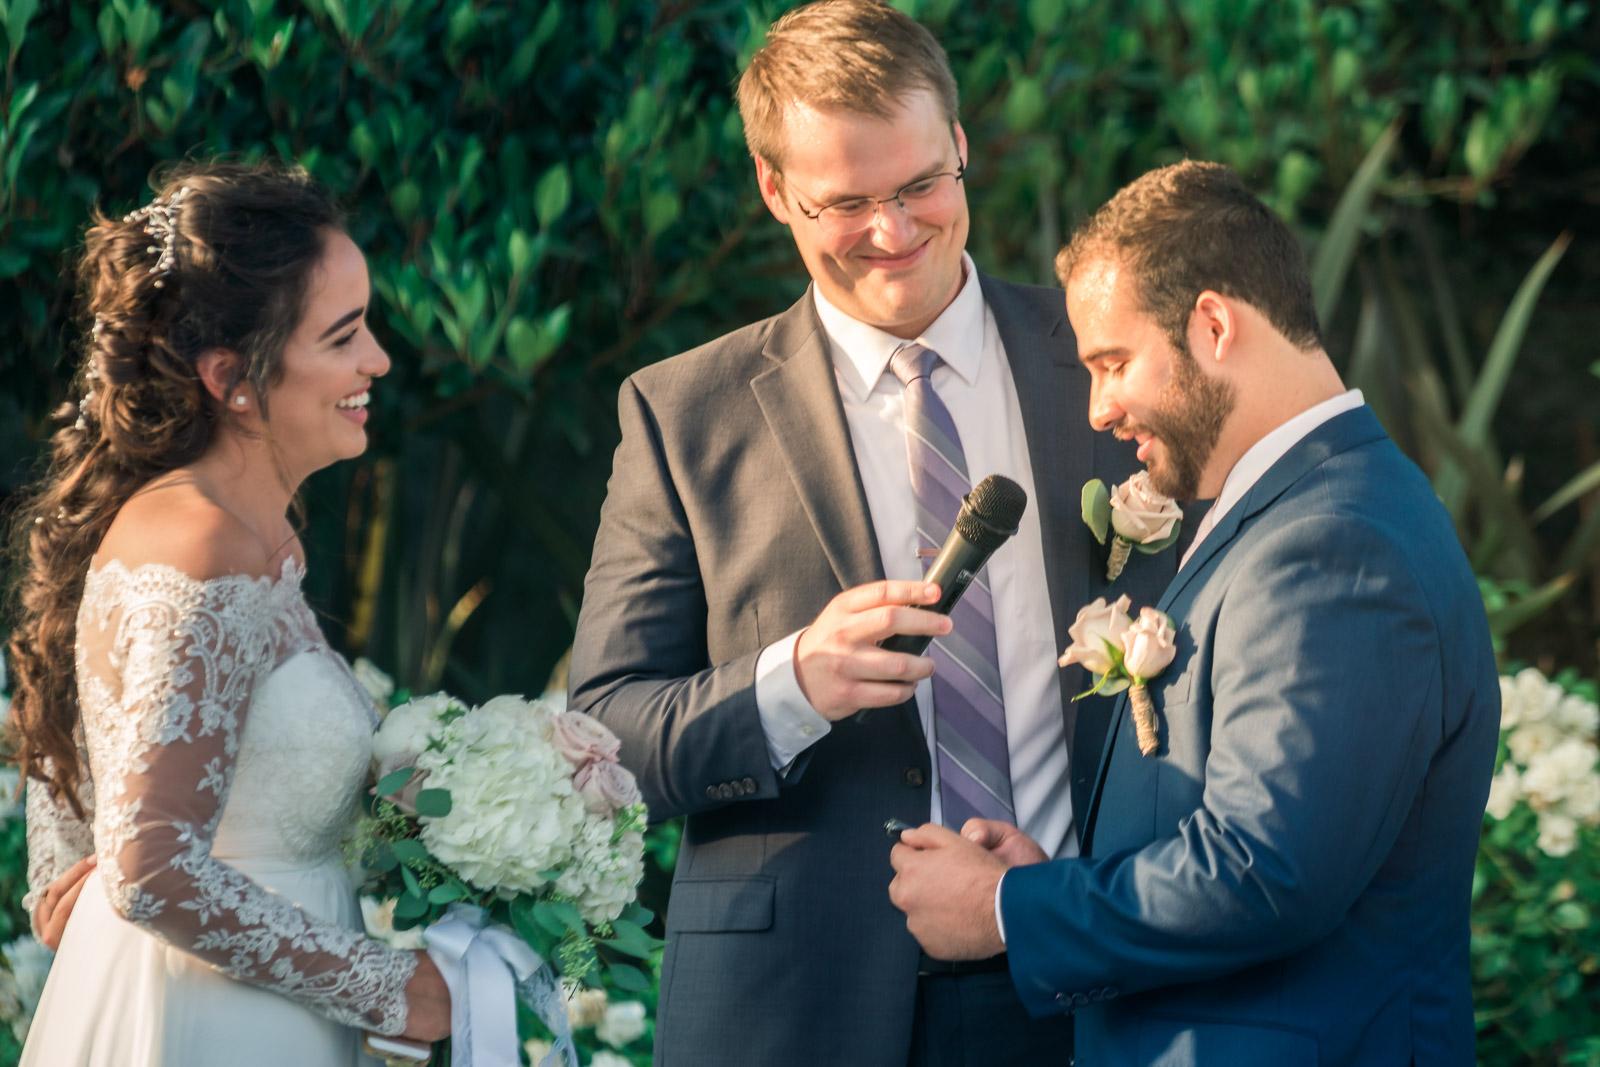 234_Angel-Brea-Orange-County_Joseph-Barber-Wedding-Photography.jpg